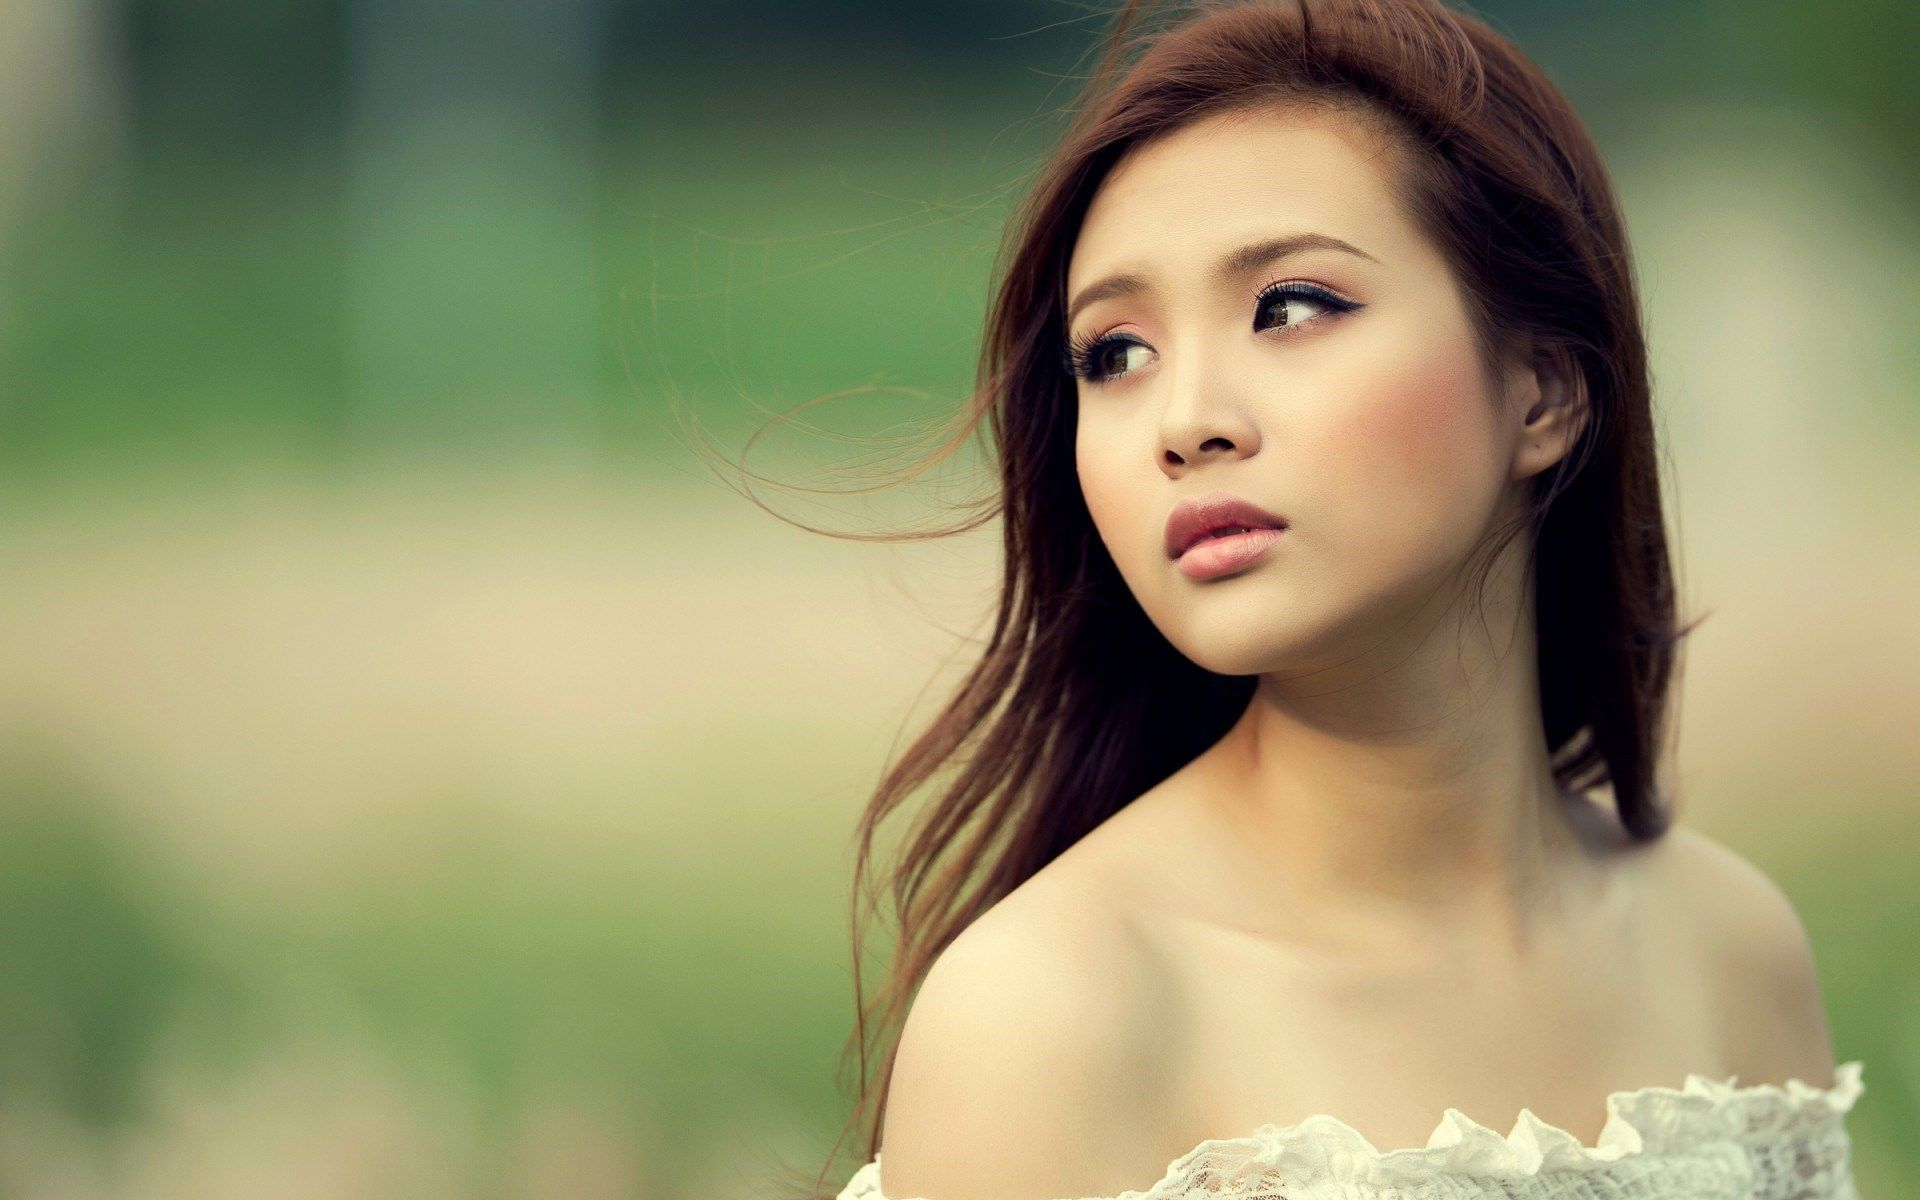 Girl Asian Portrait Hd Wallpaper - Asian Girl , HD Wallpaper & Backgrounds